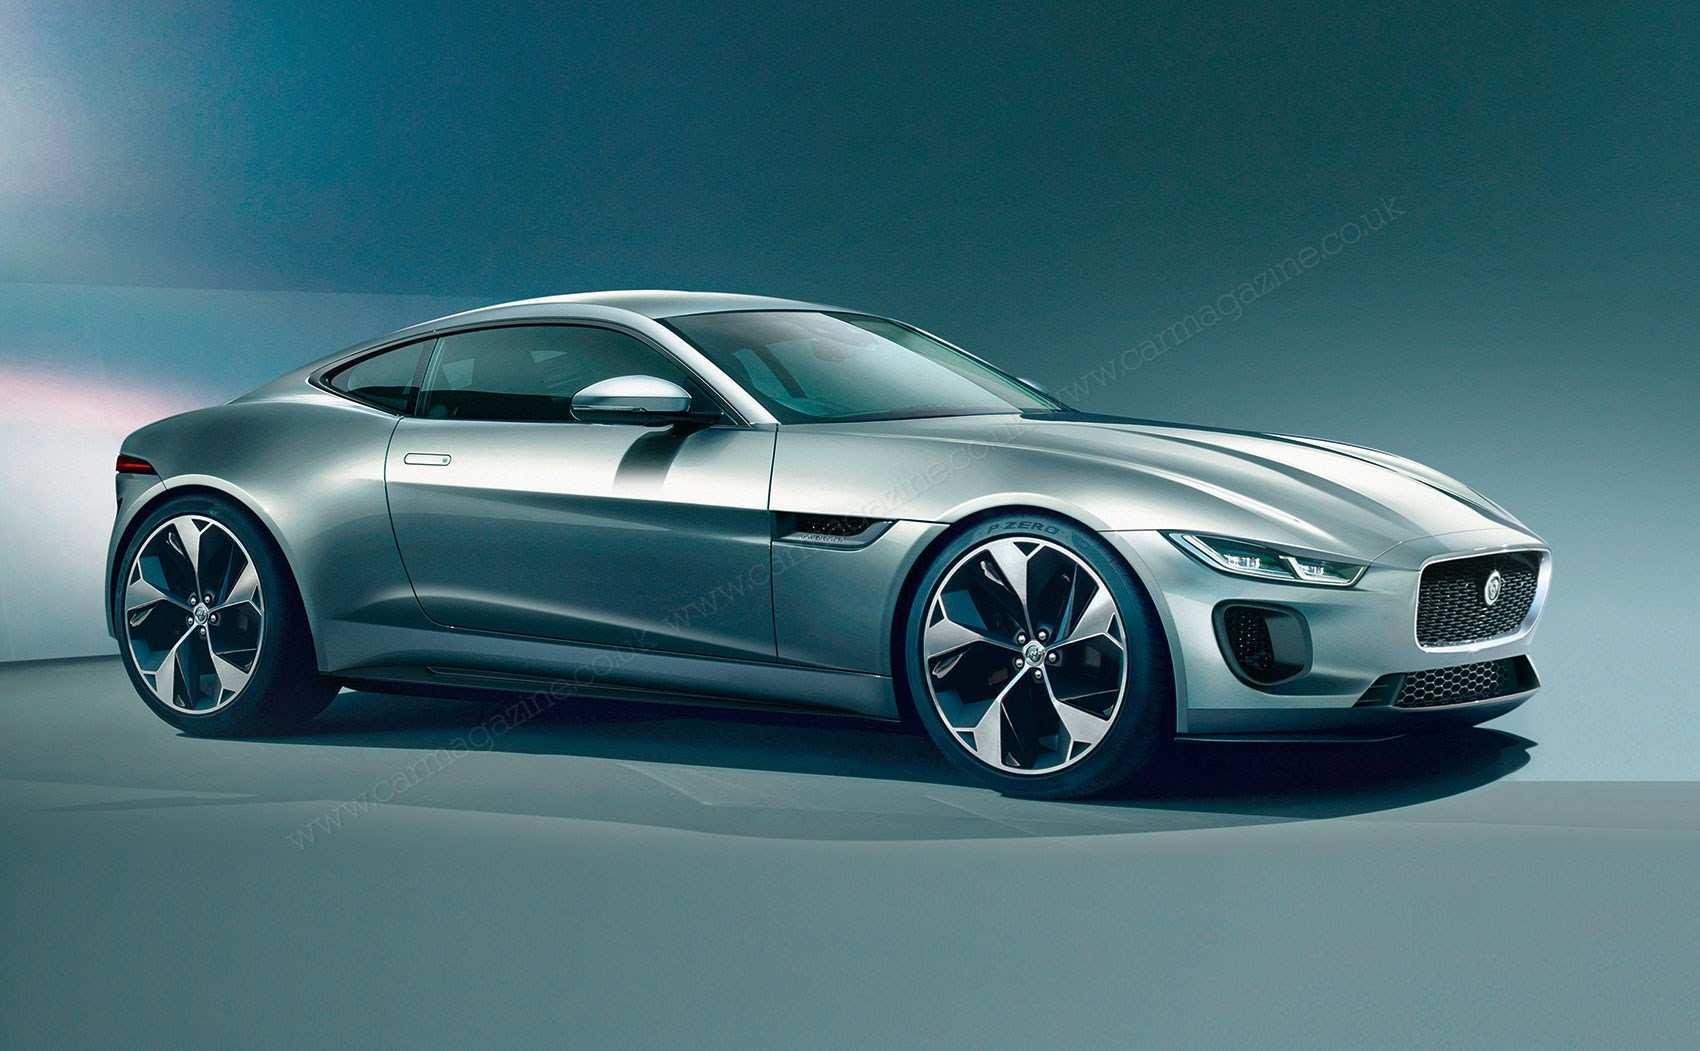 35 Concept of Jaguar F Type 2020 Release Date Specs and Review for Jaguar F Type 2020 Release Date